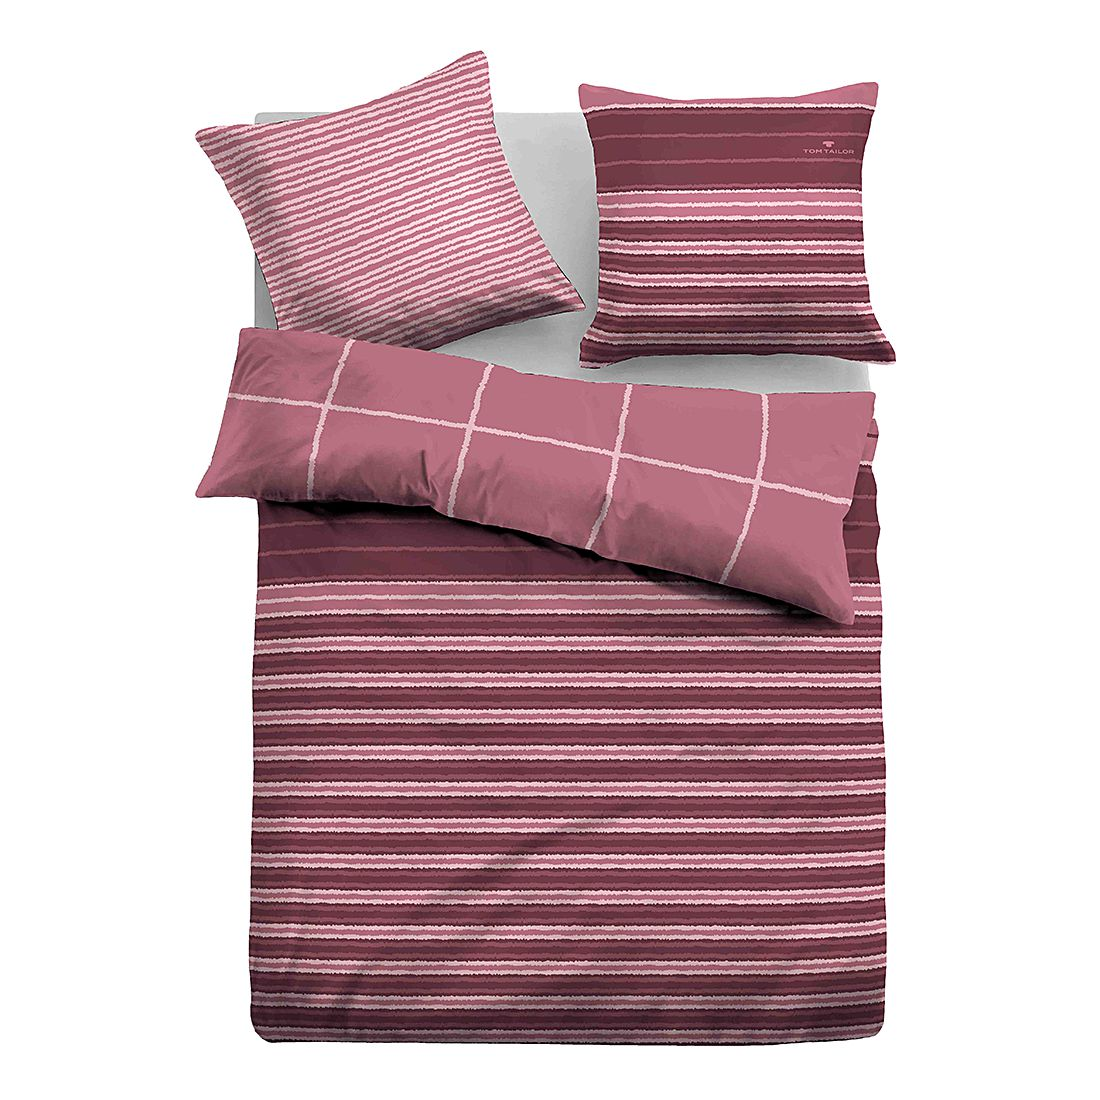 Satin Bettwäsche Linien – Rosa / Bordeaux – 155 x 200 cm + Kissen 80 x 80 cm, Tom Tailor jetzt bestellen